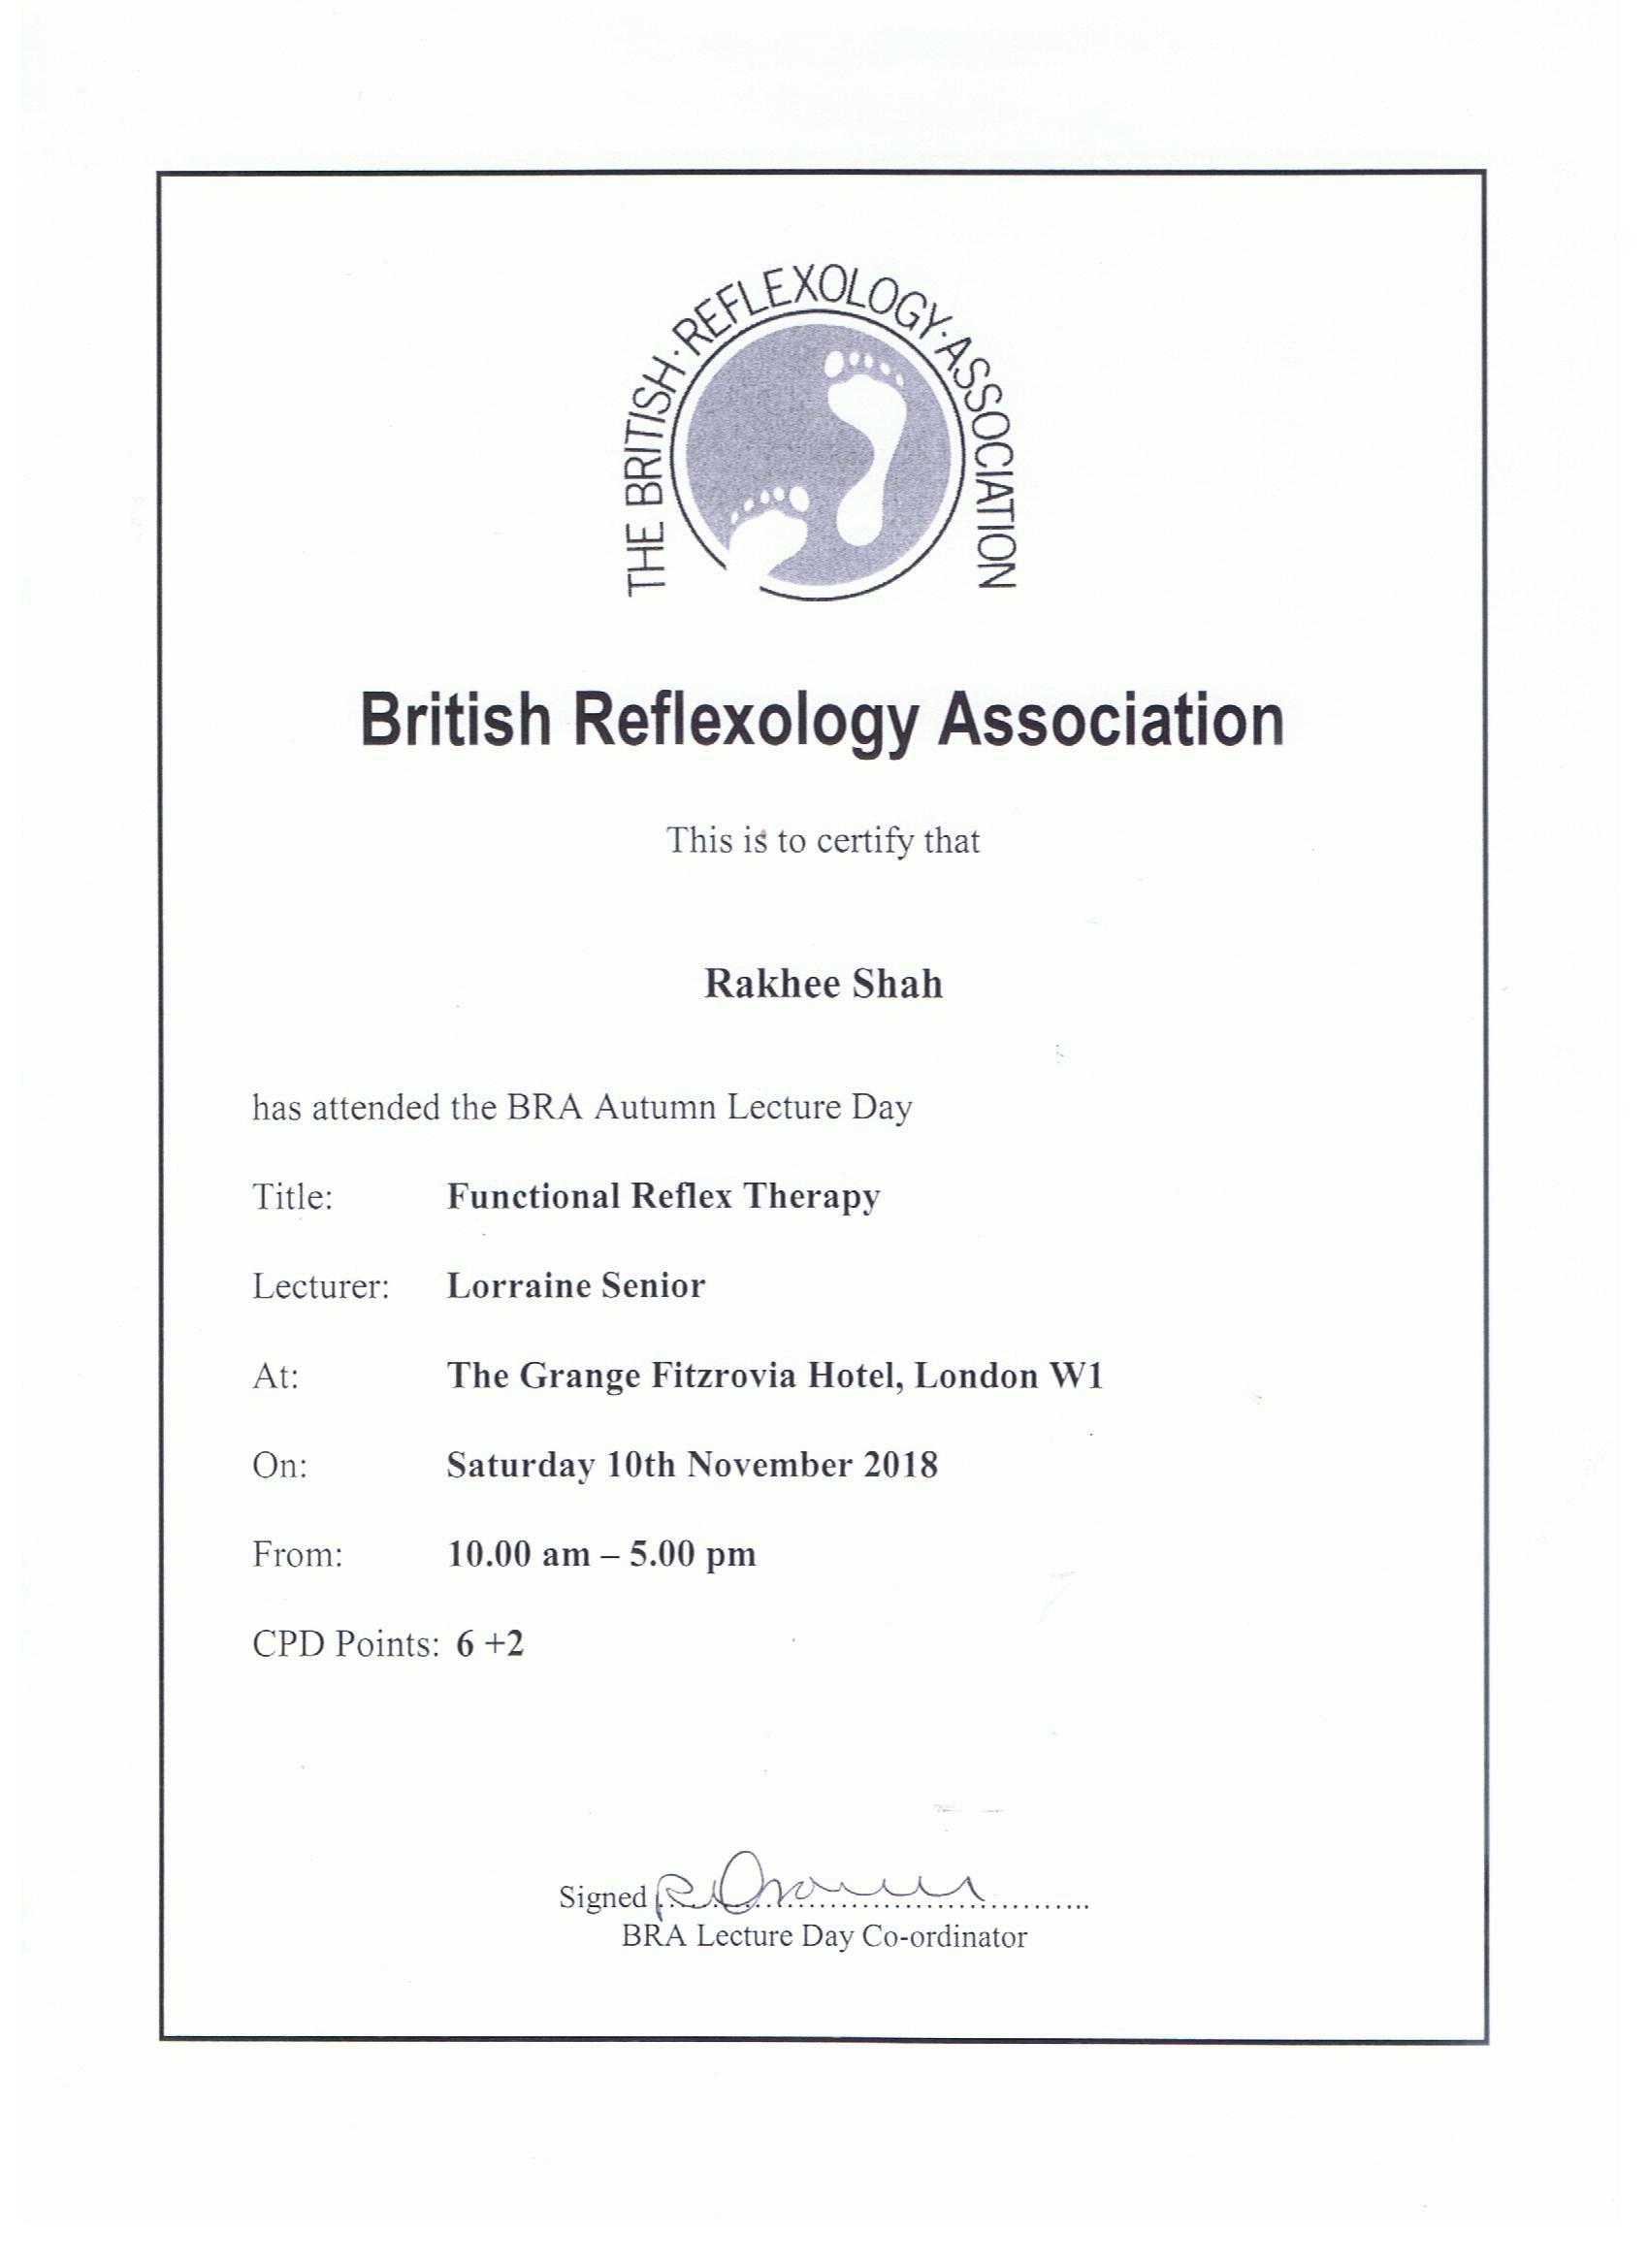 rakhee-shah-healthy-u-professional-reflexology-certificate-3